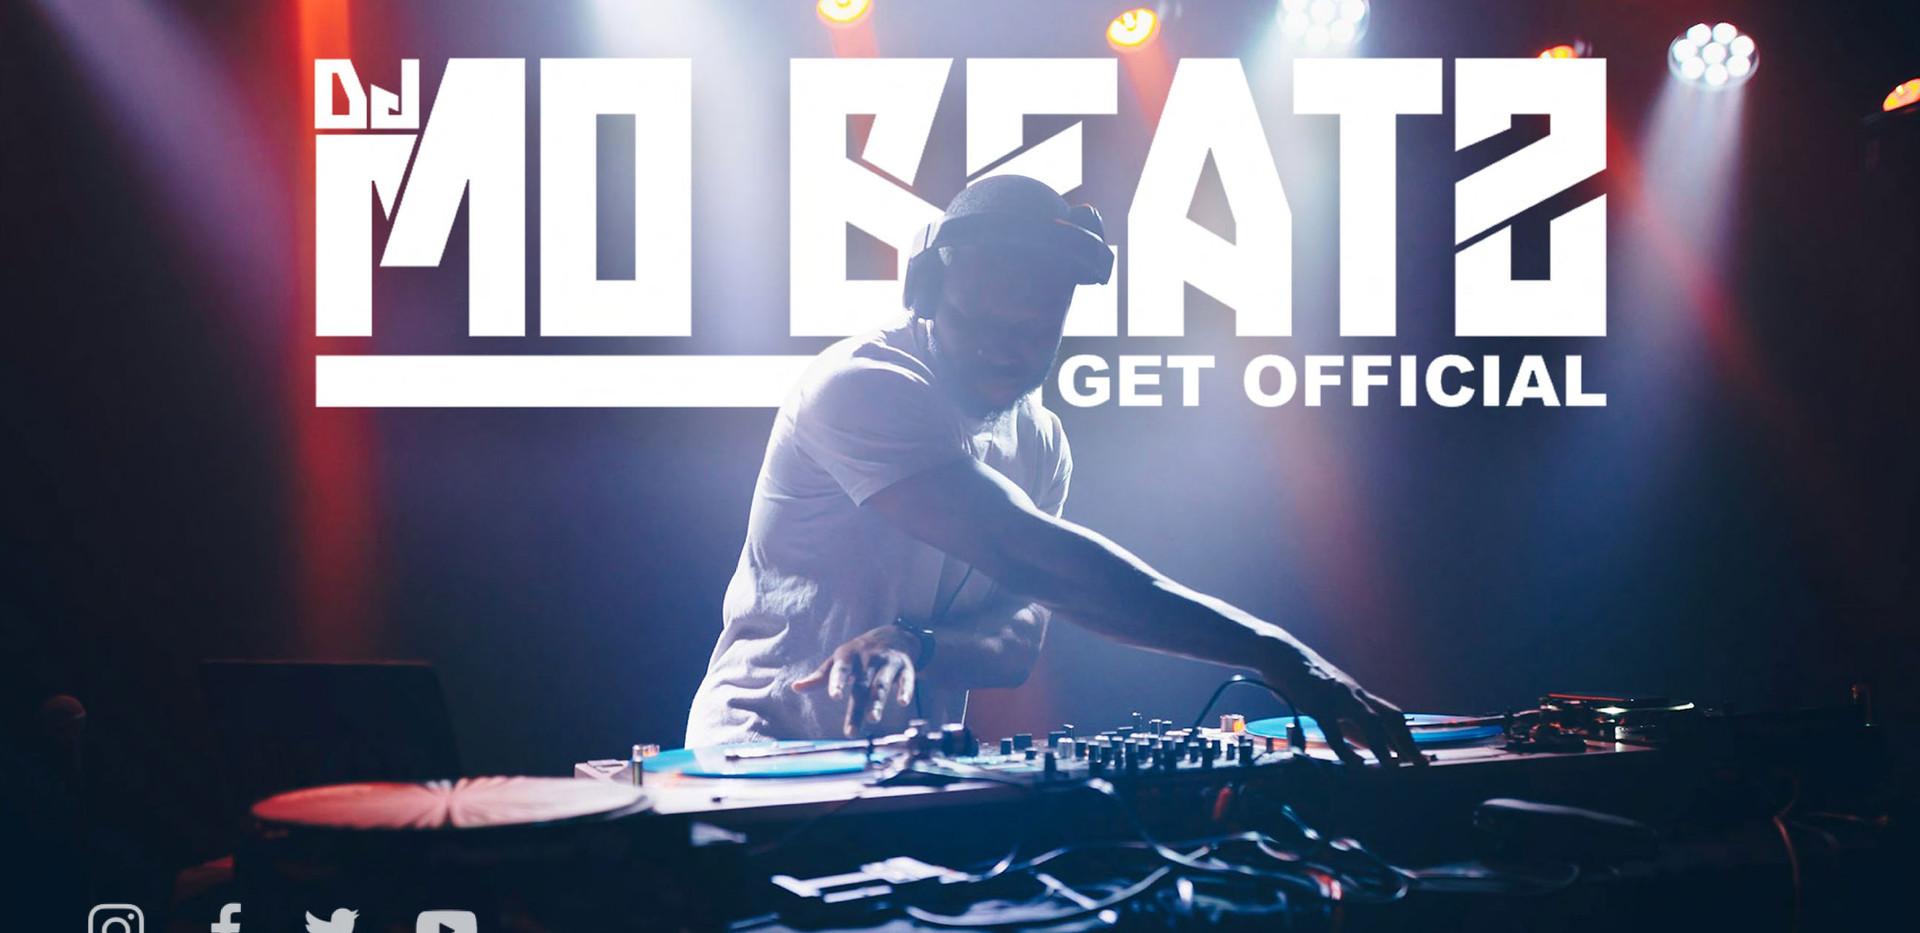 DJ_Mo_Beatz-1.jpg